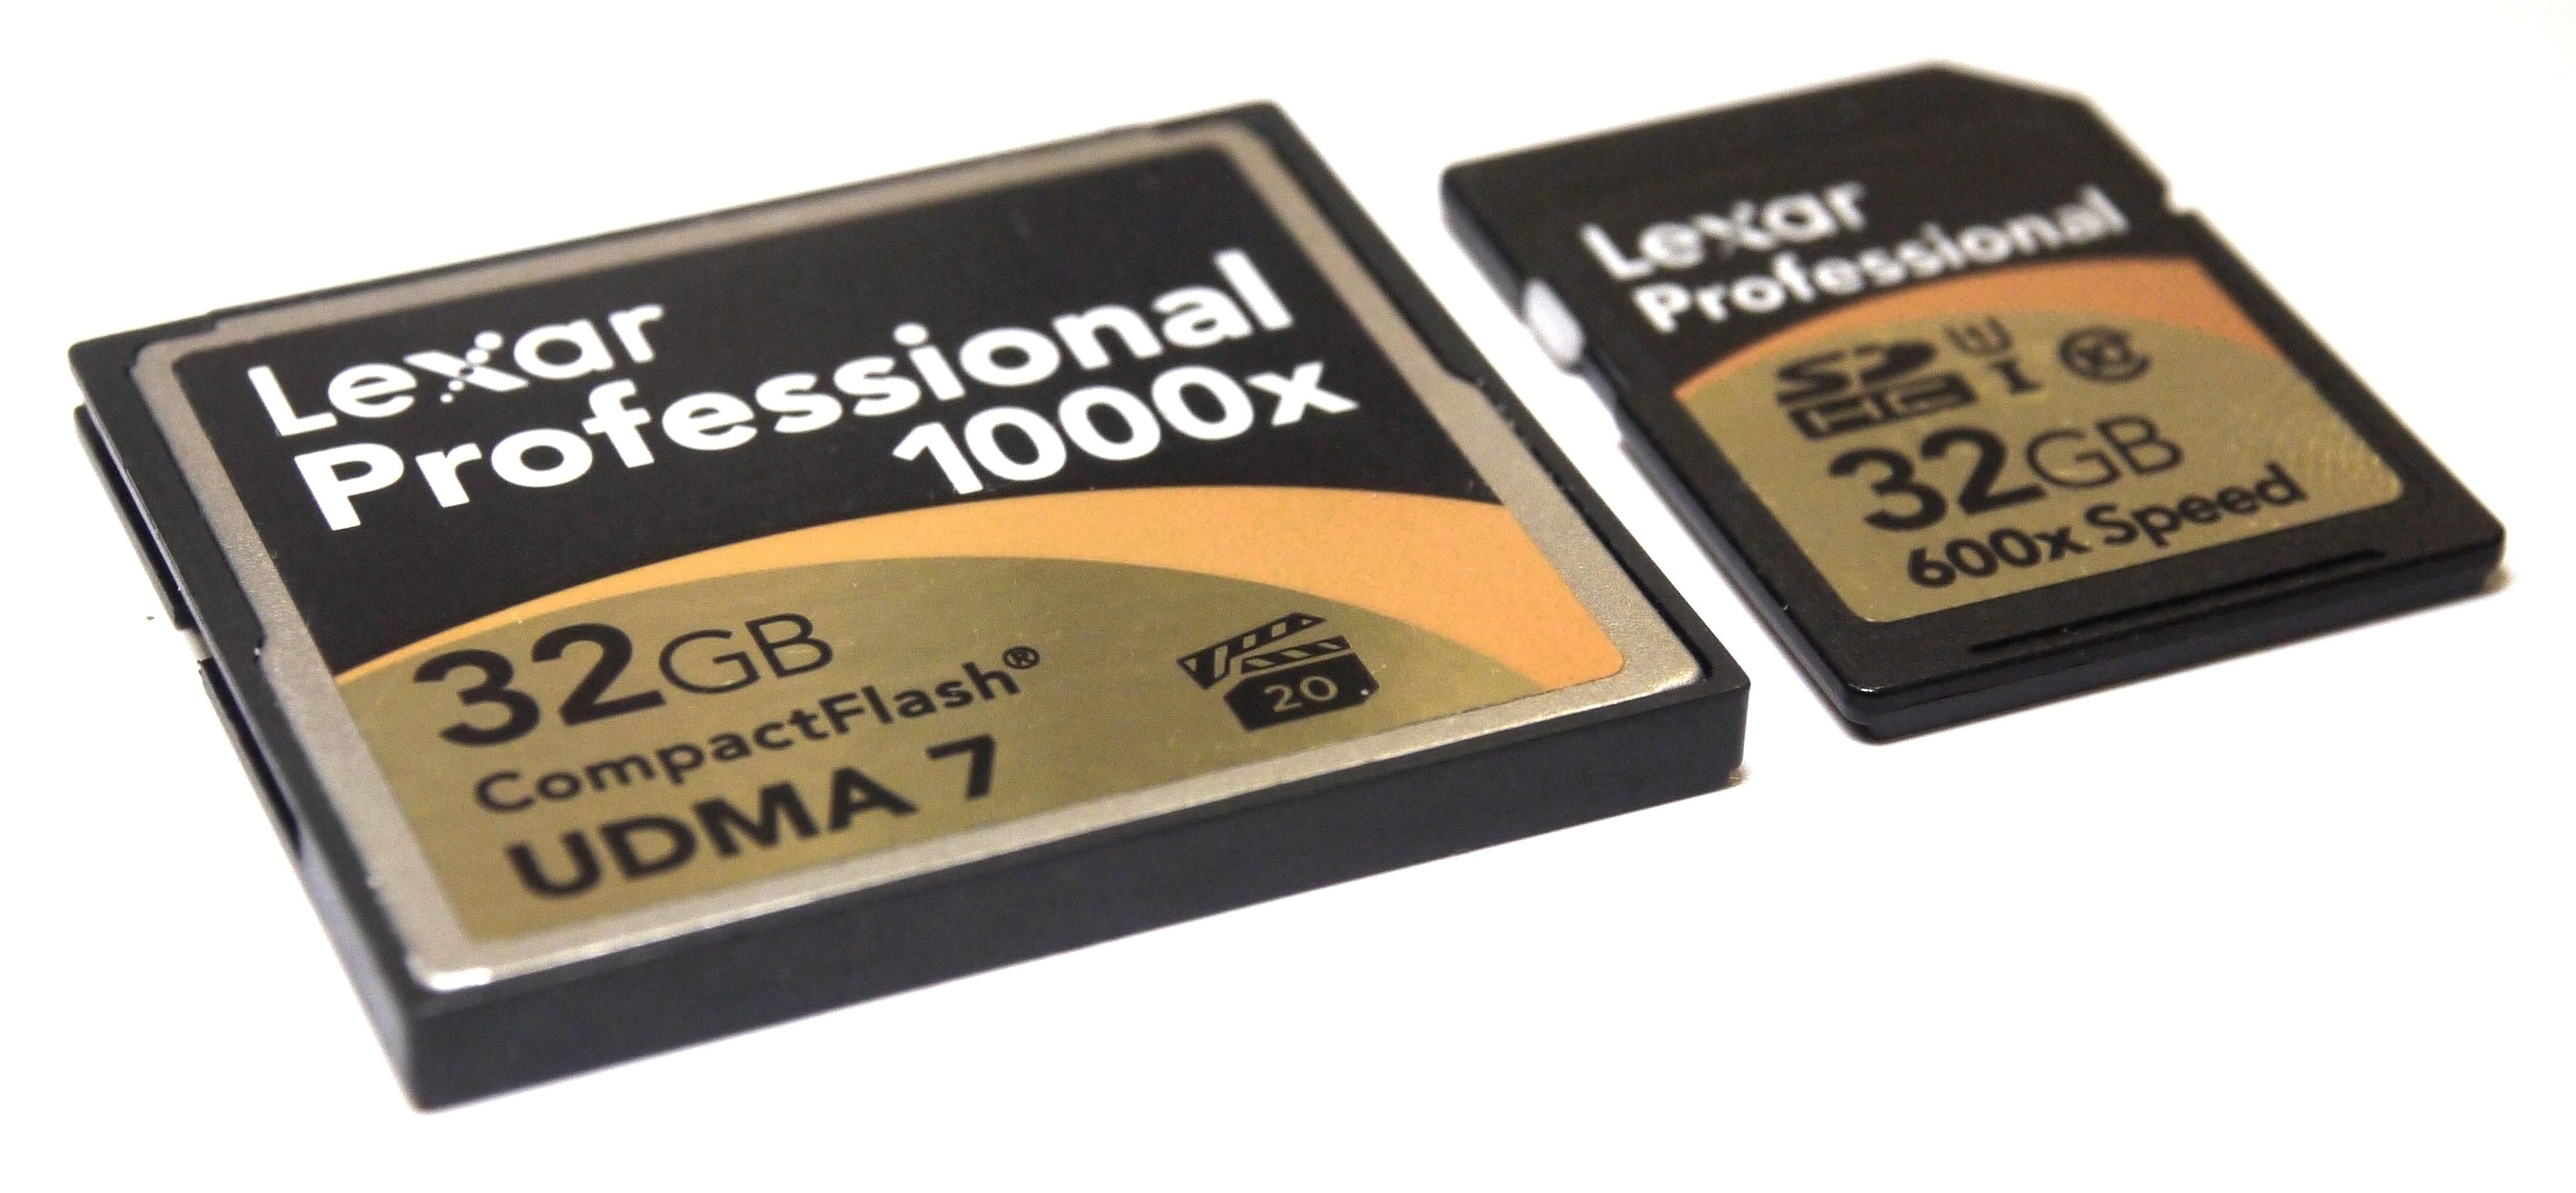 Lexar Professional 1000x Compactflash 600x Sdhc Review Team Micro Sd Uhs 1 16gb Usb Card Reader 45mb S Compact Flash